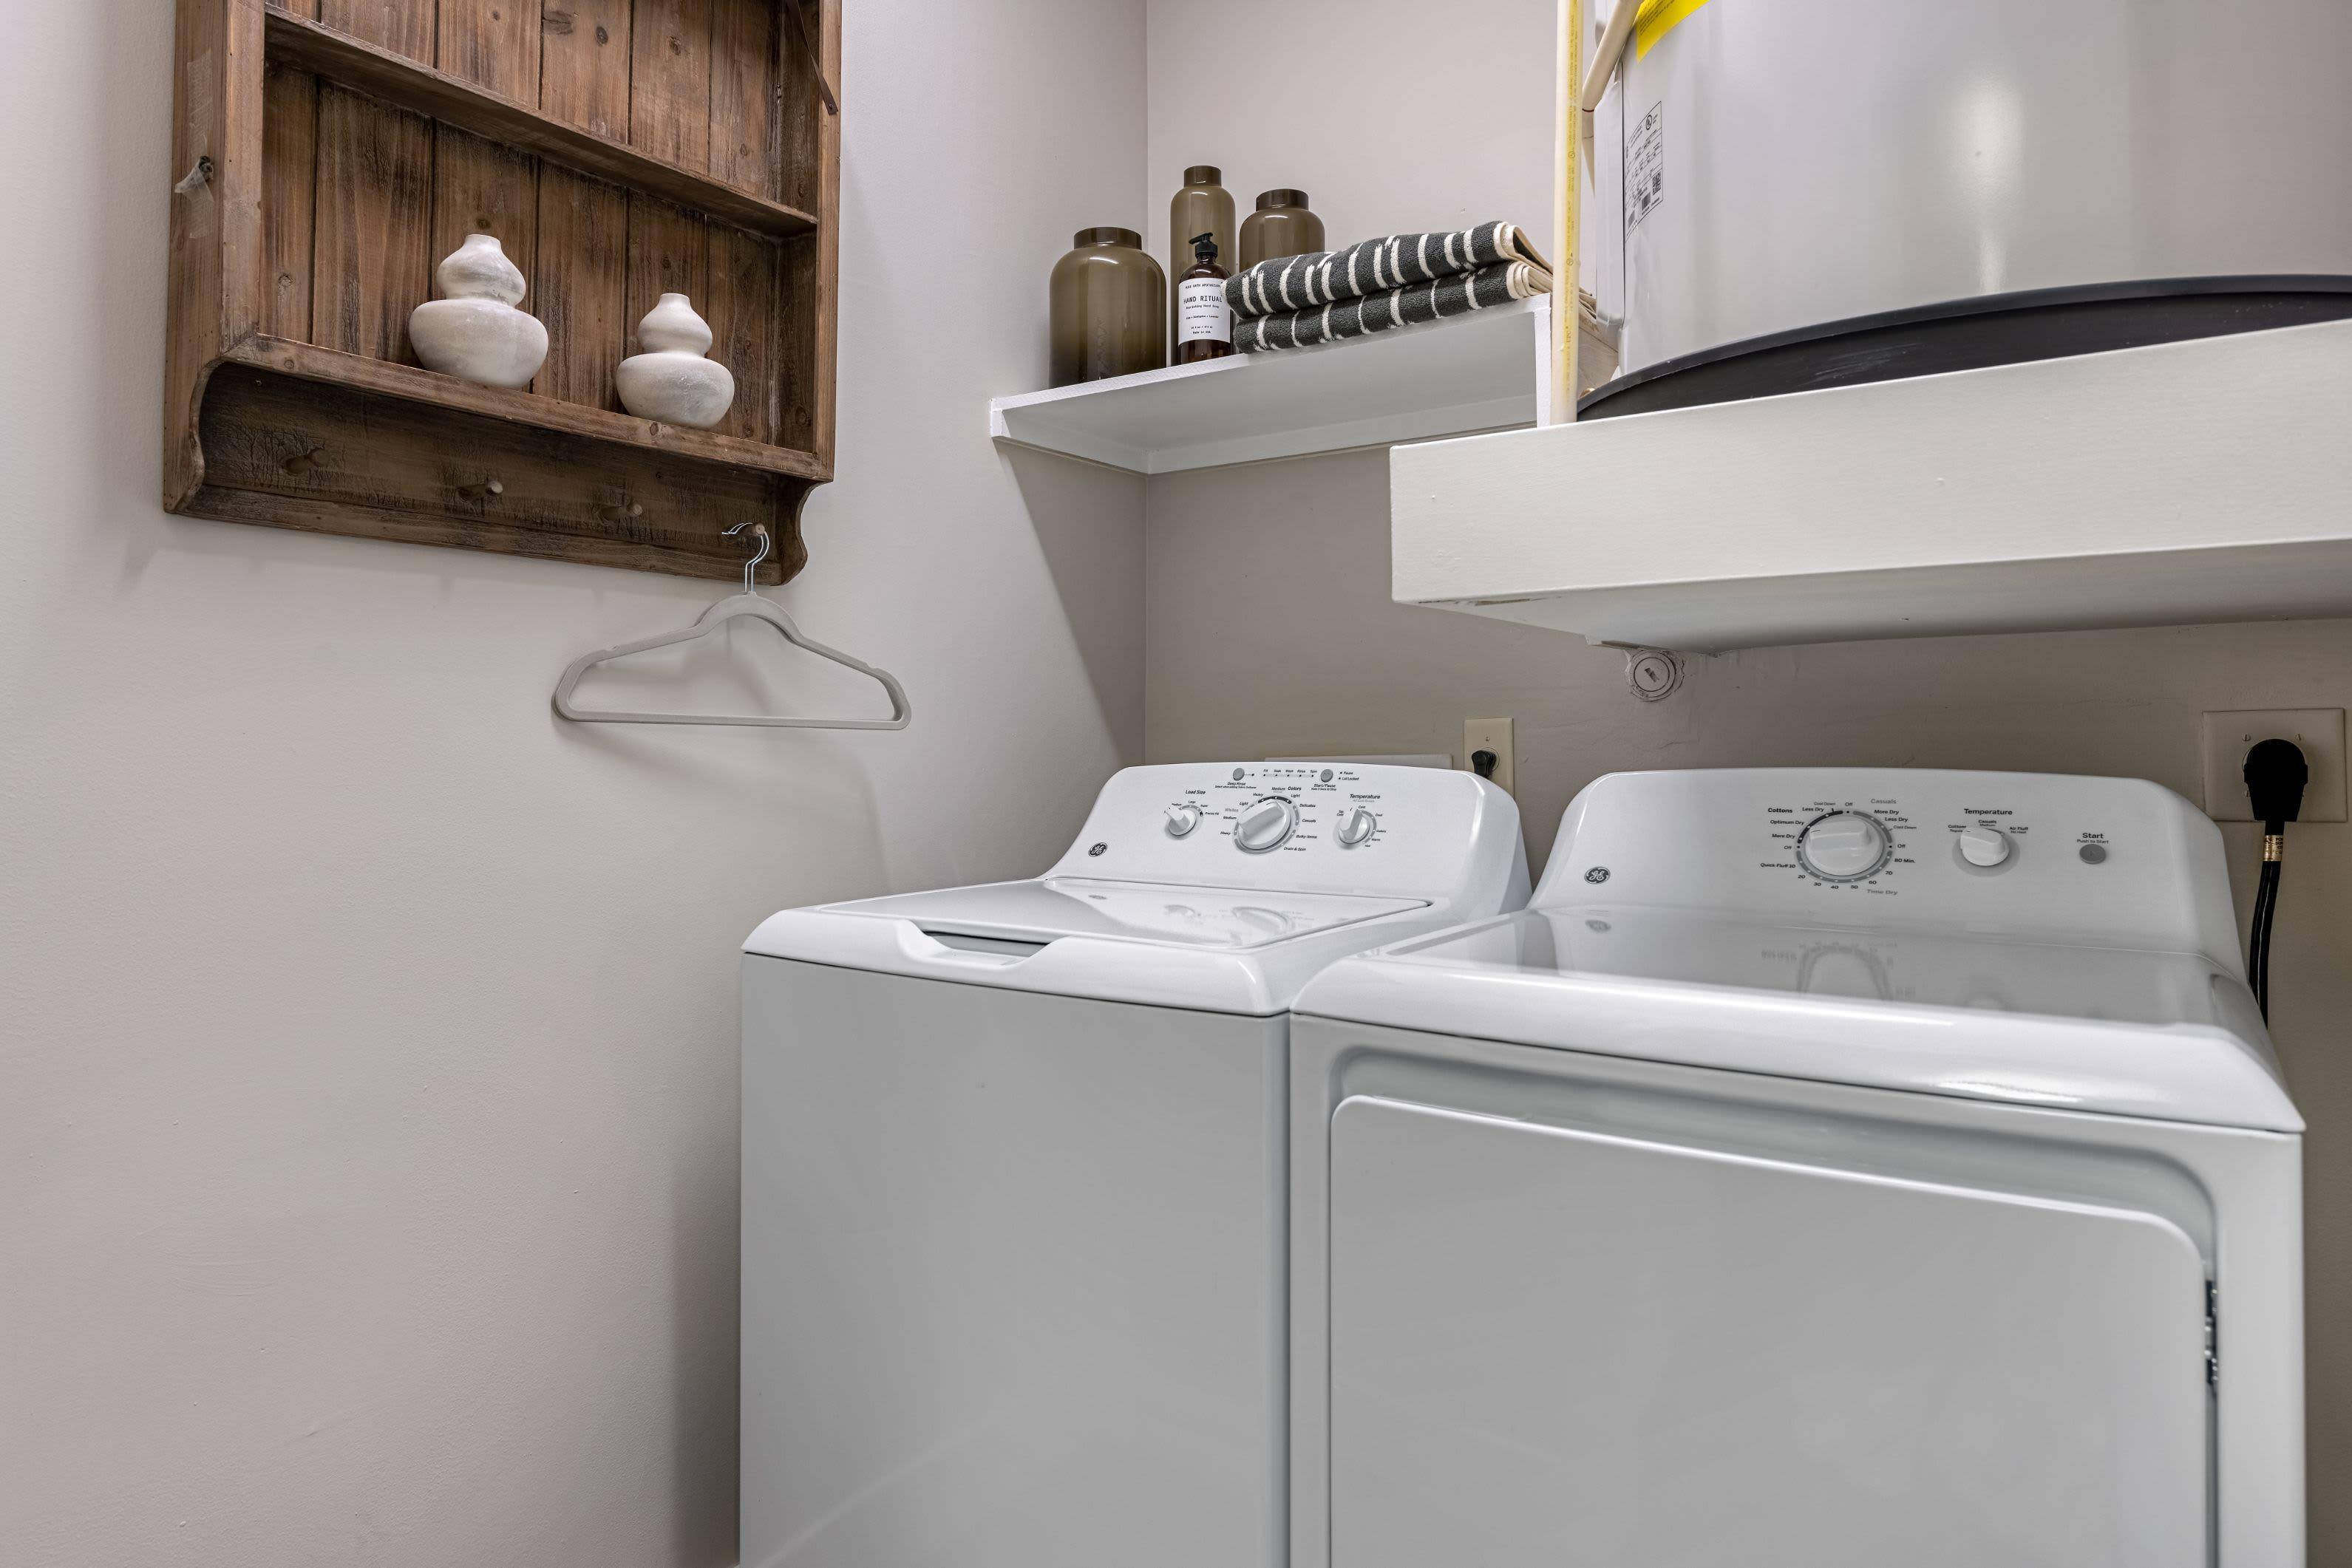 Washer and dryer at Marquis Cresta Bella in San Antonio, Texas